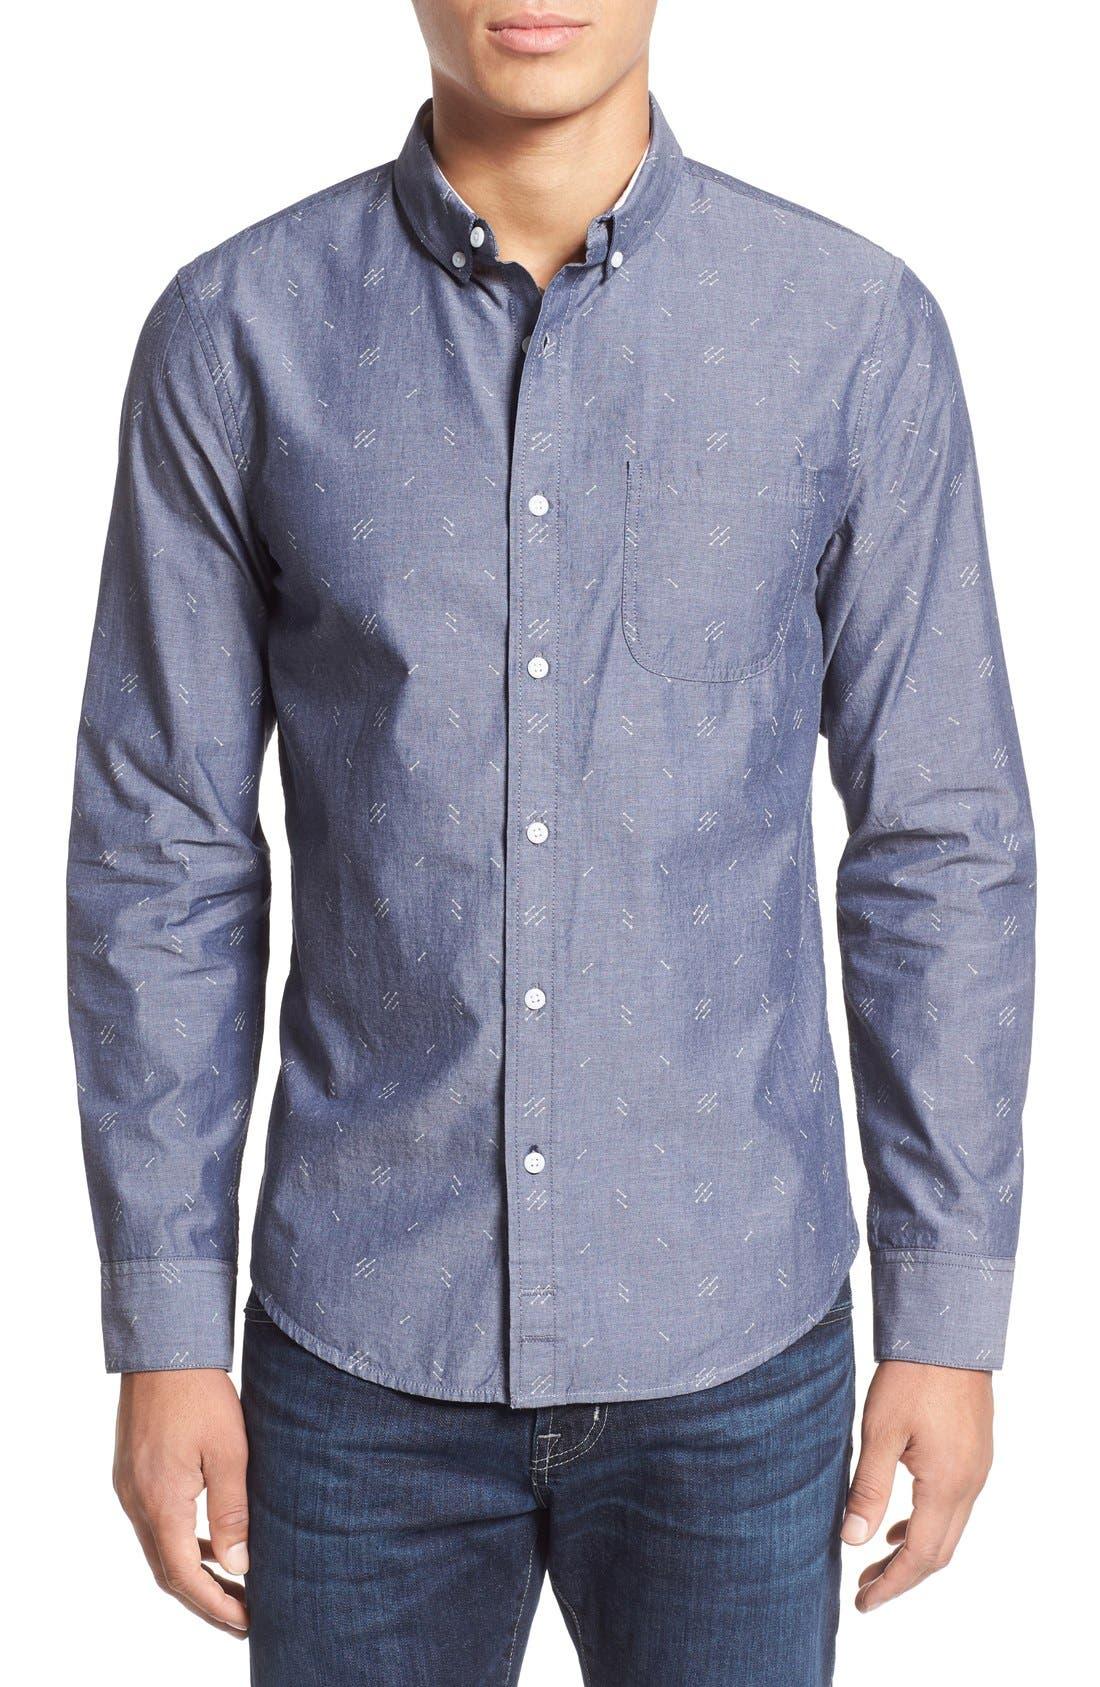 Alternate Image 1 Selected - 1901 'Baker' Slim Fit Arrow Print Woven Shirt